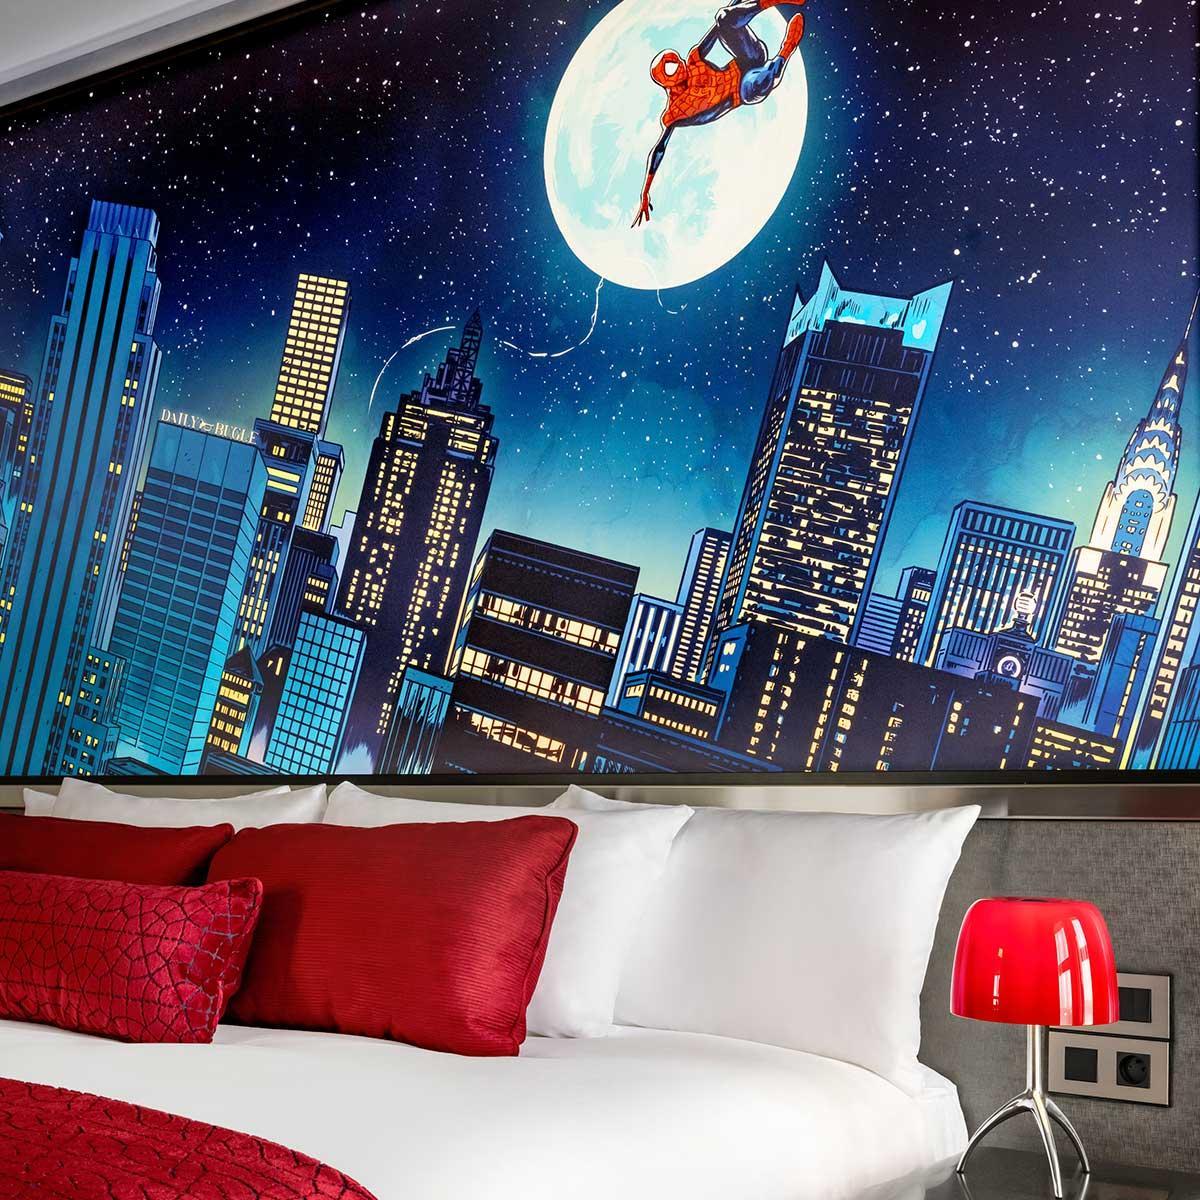 Chambres Empire State Club & Suites et Empire State Club Lounge digne de Tony Stark